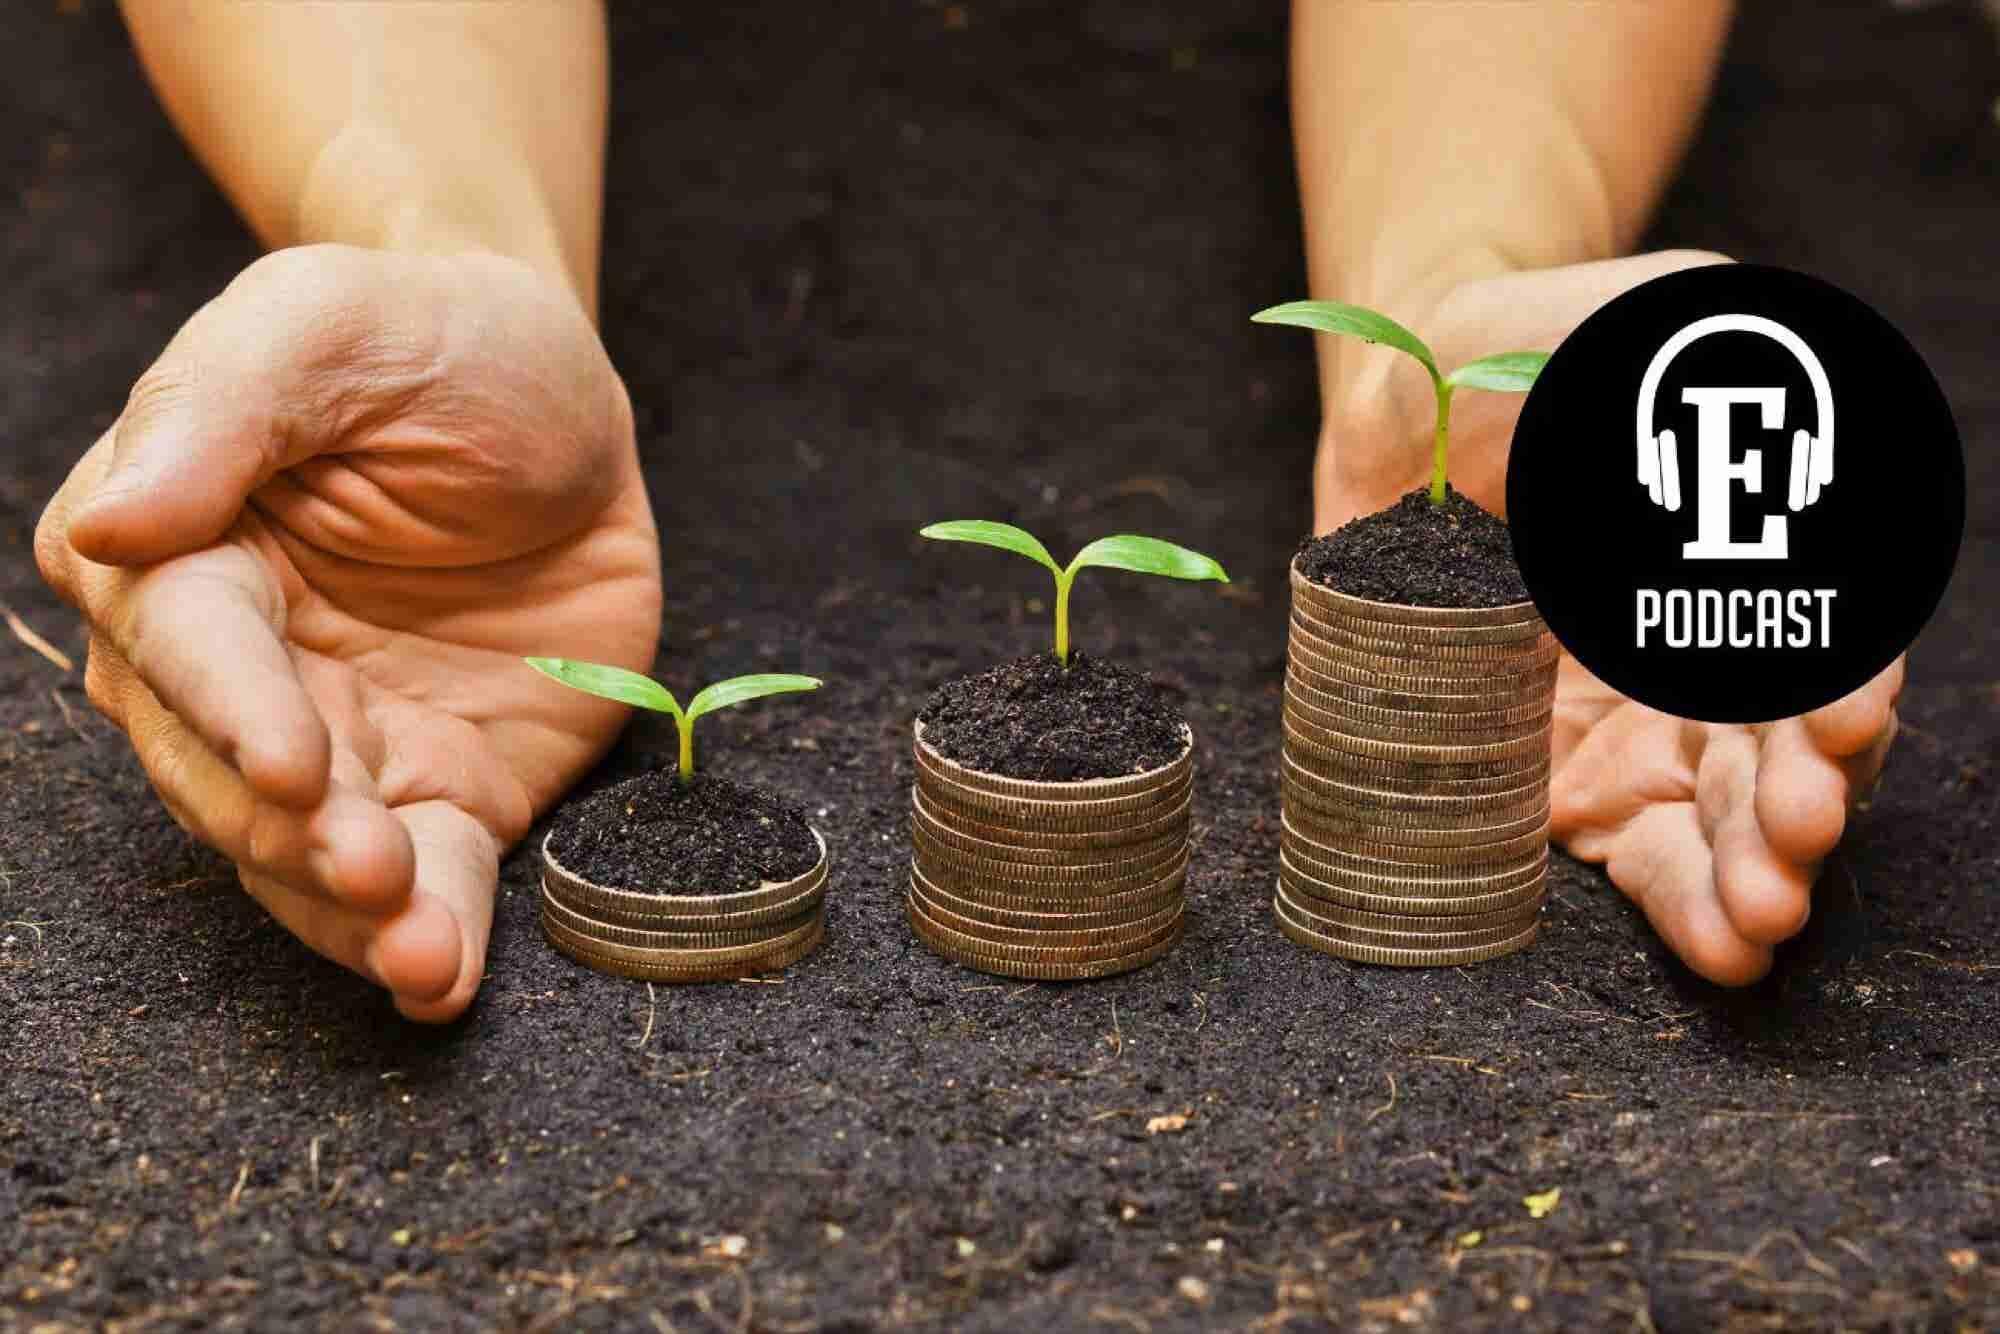 Podcast Entrepreneur #4: Consejos de Juan del Cerro para impulsar tu startup social